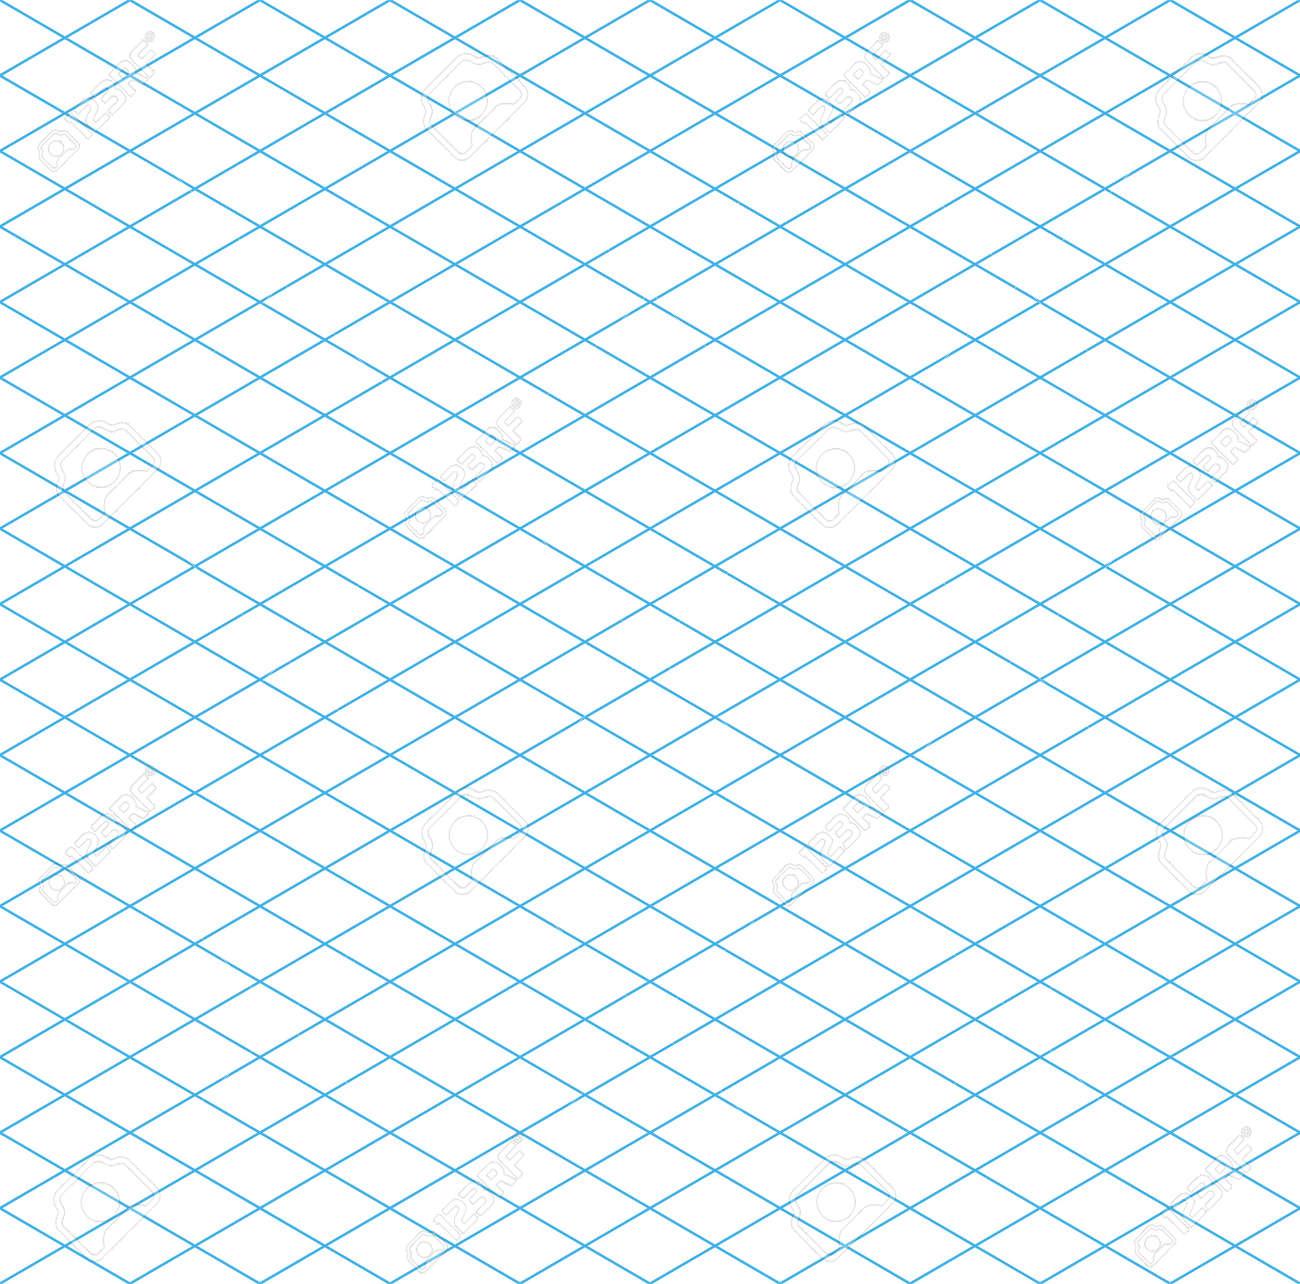 Seamless Isometric Grid Pattern, Vector Illustration, EPS 10 ...